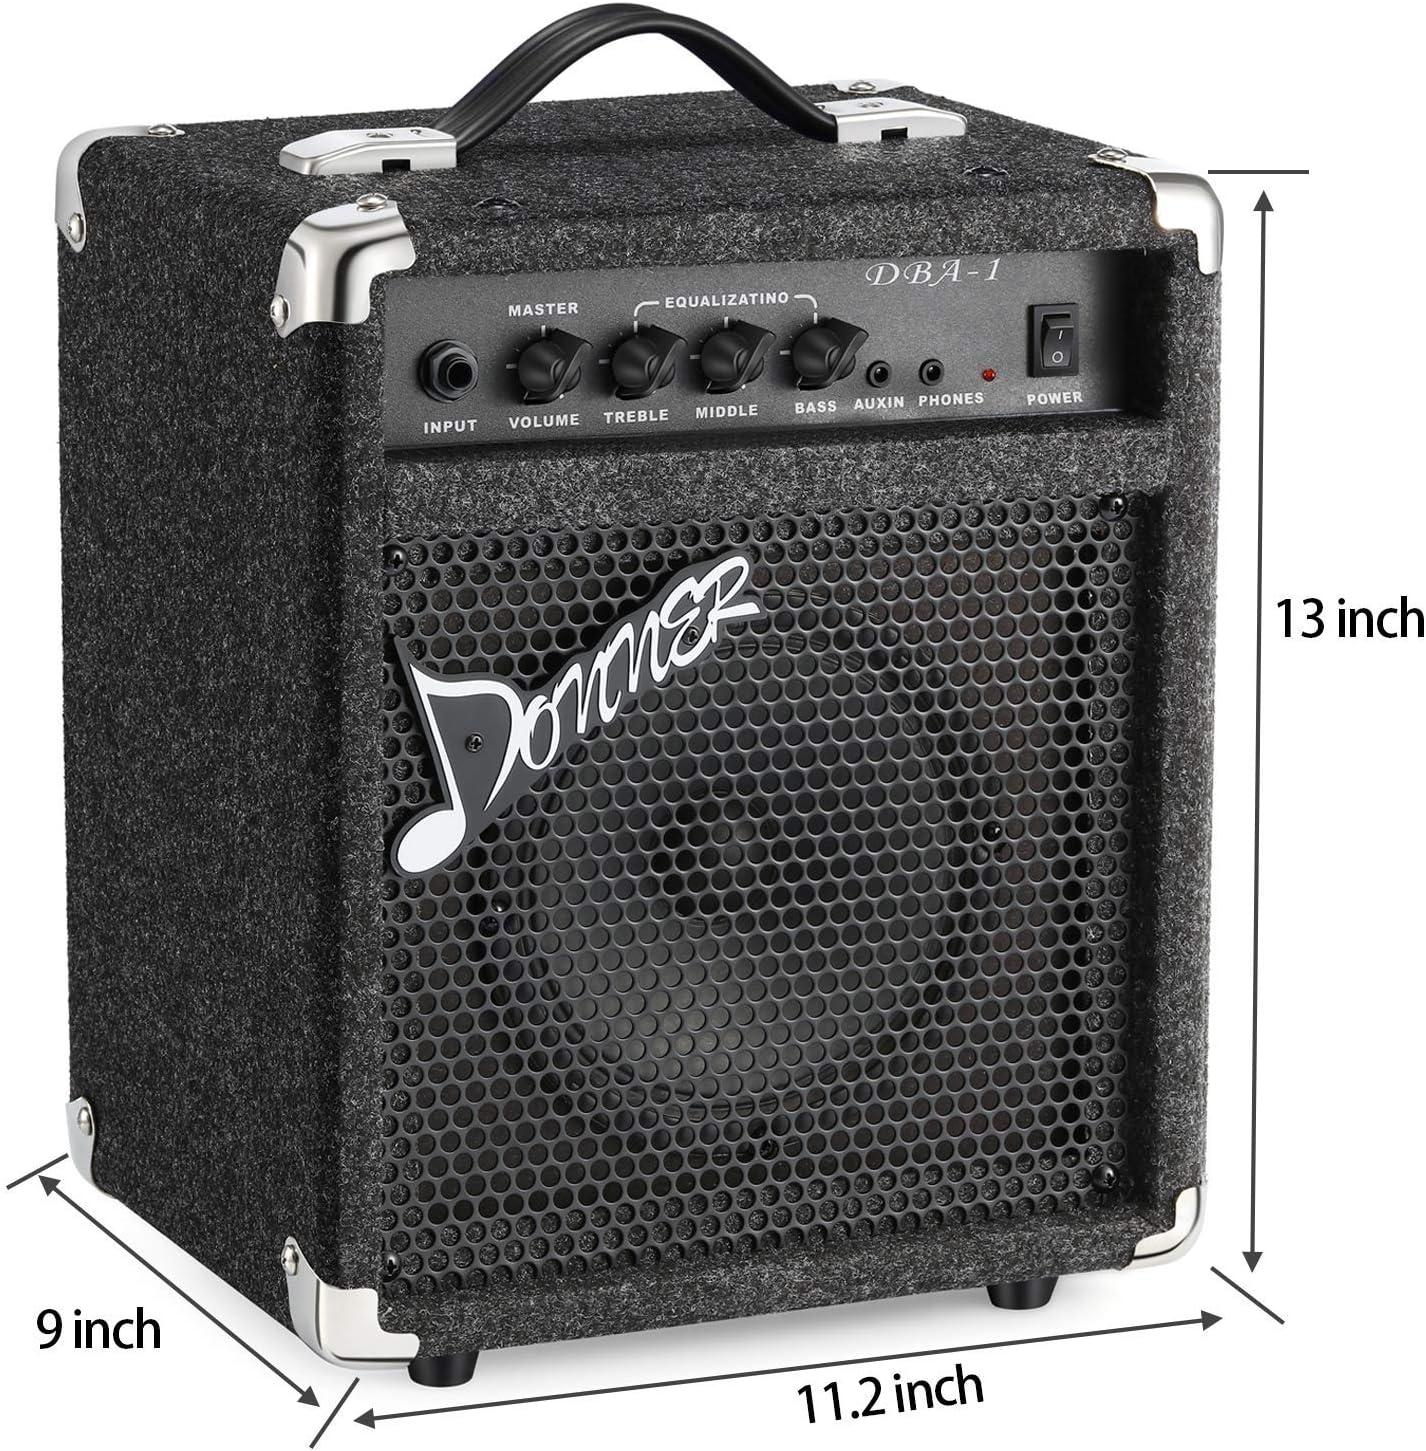 Donner DPB-510B Full-Size Full Size 4 Strings Electric Bass Guitar Sunburst Beginner Starter Kit with Bag and Bass Amp 15W Bass Guitar Amplifier DBA-1